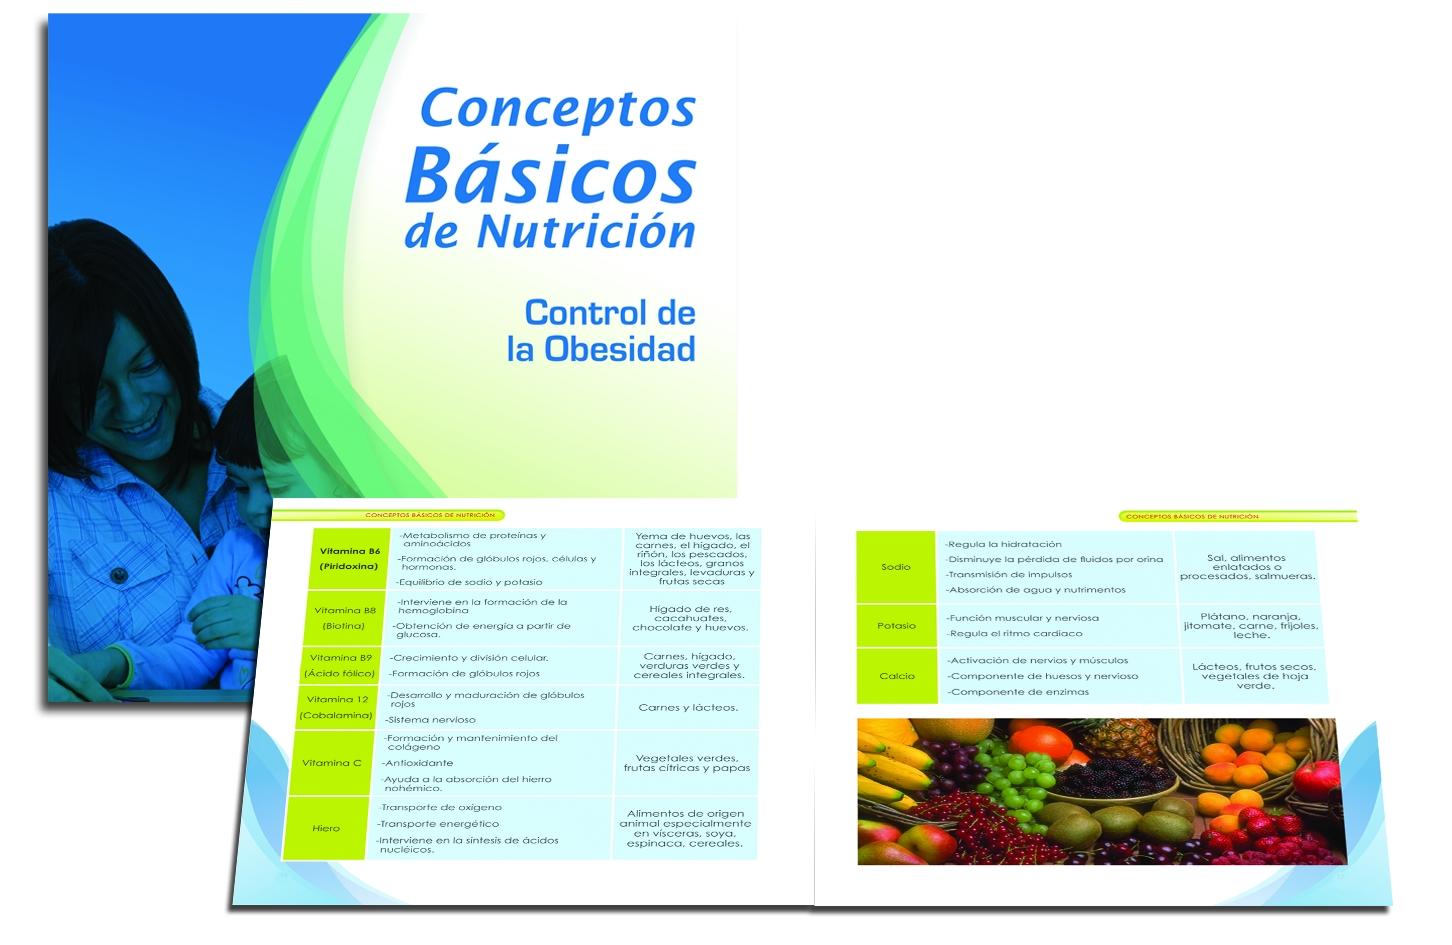 7101 Conceptos Básicos de Nutrición